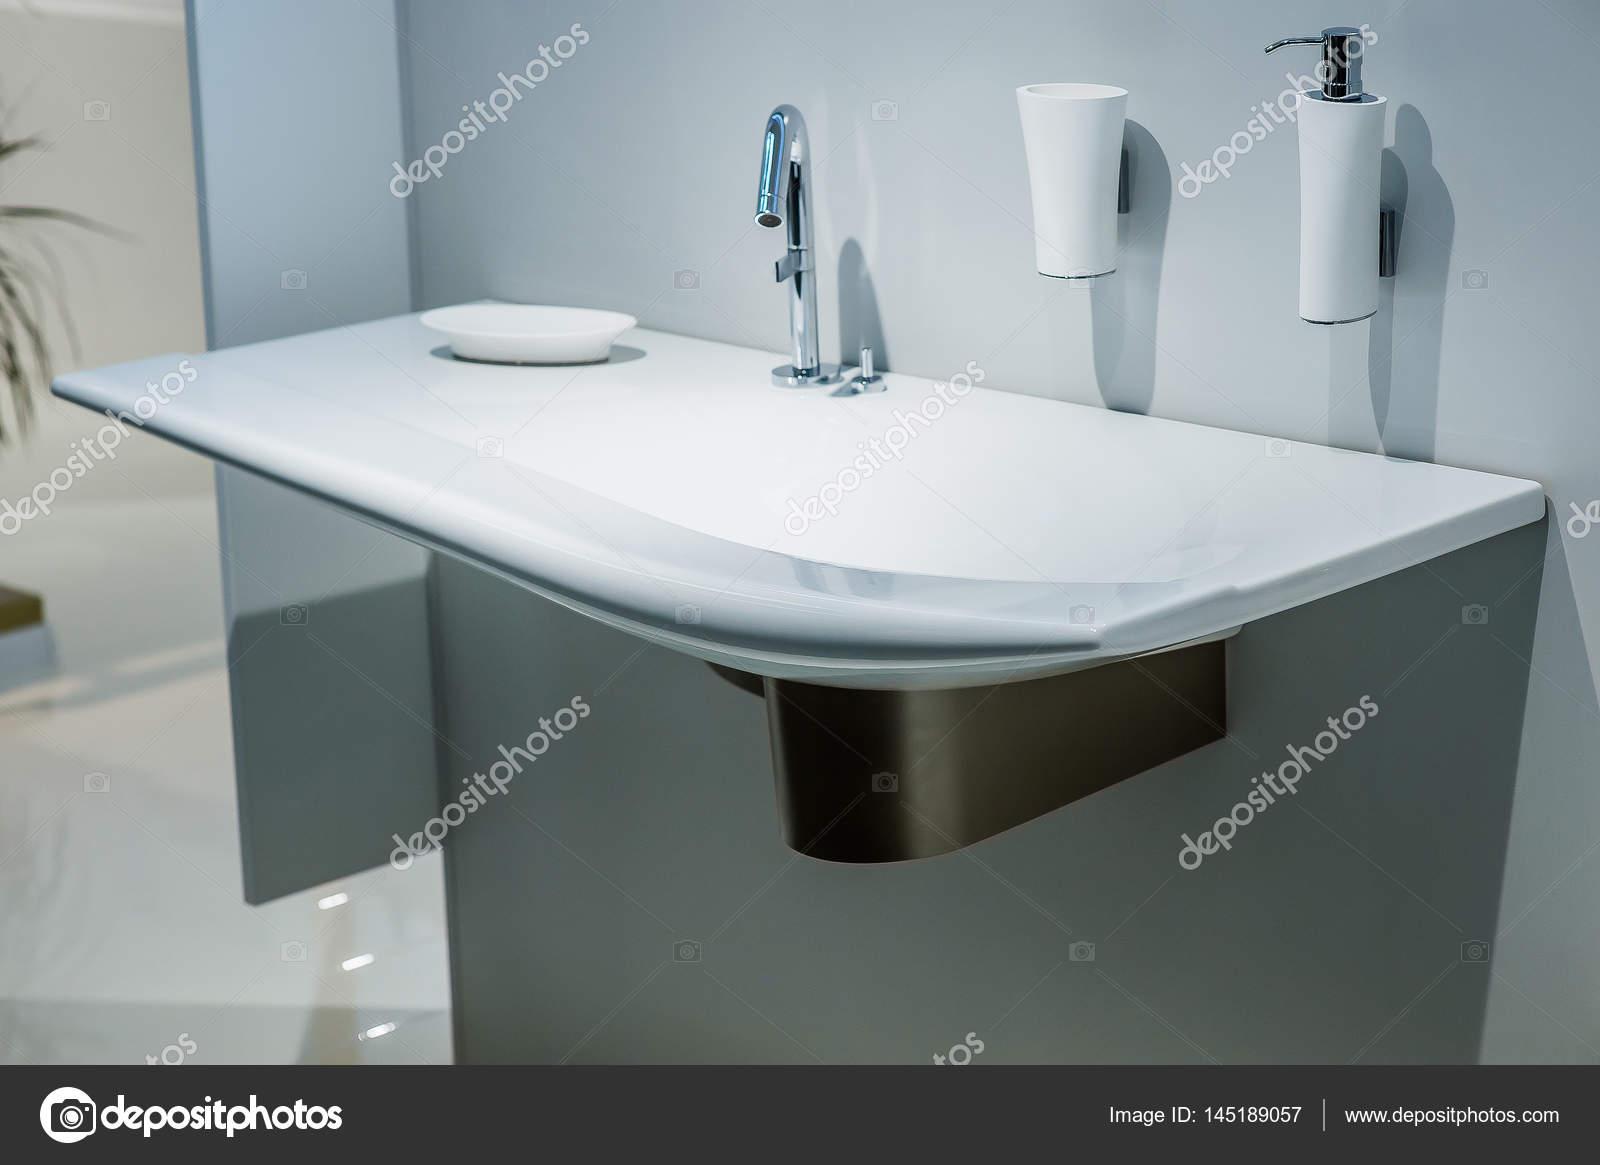 Wasbak en kraan in de badkamer — Stockfoto © kiriak09 #145189057